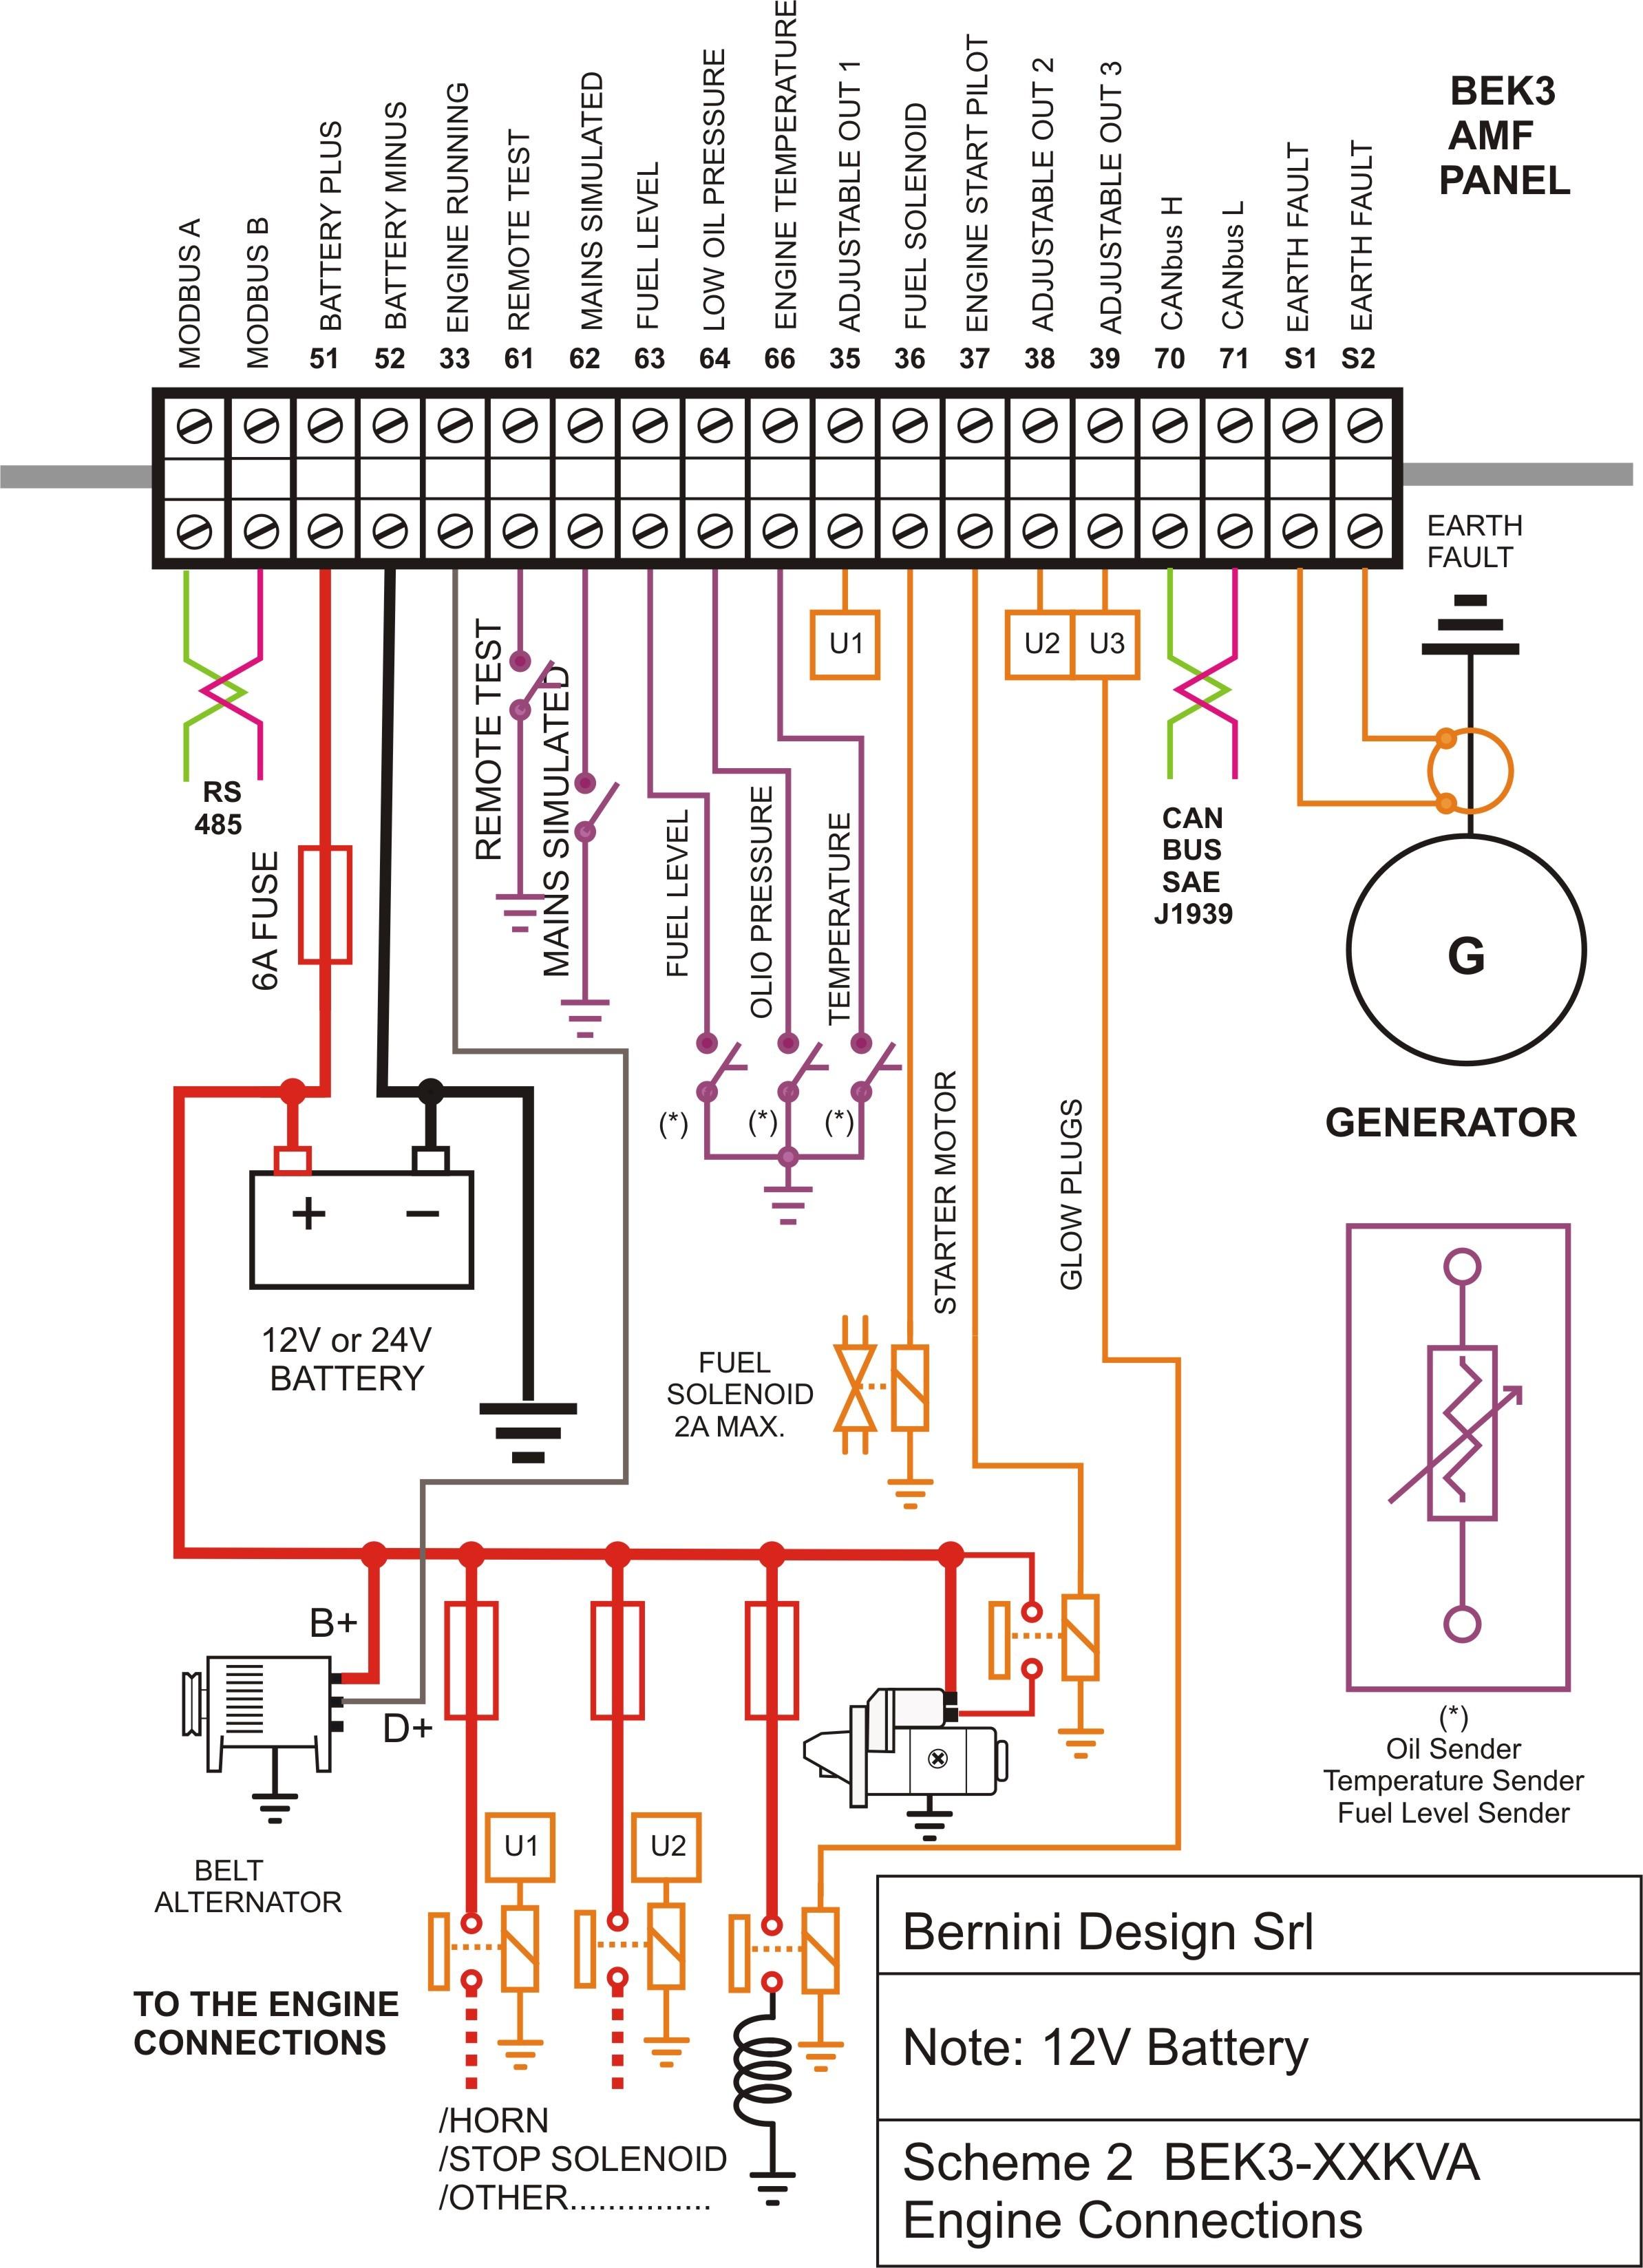 Motor Control Panel Wiring Diagram Electric Motor Drawing at Getdrawings Of Motor Control Panel Wiring Diagram